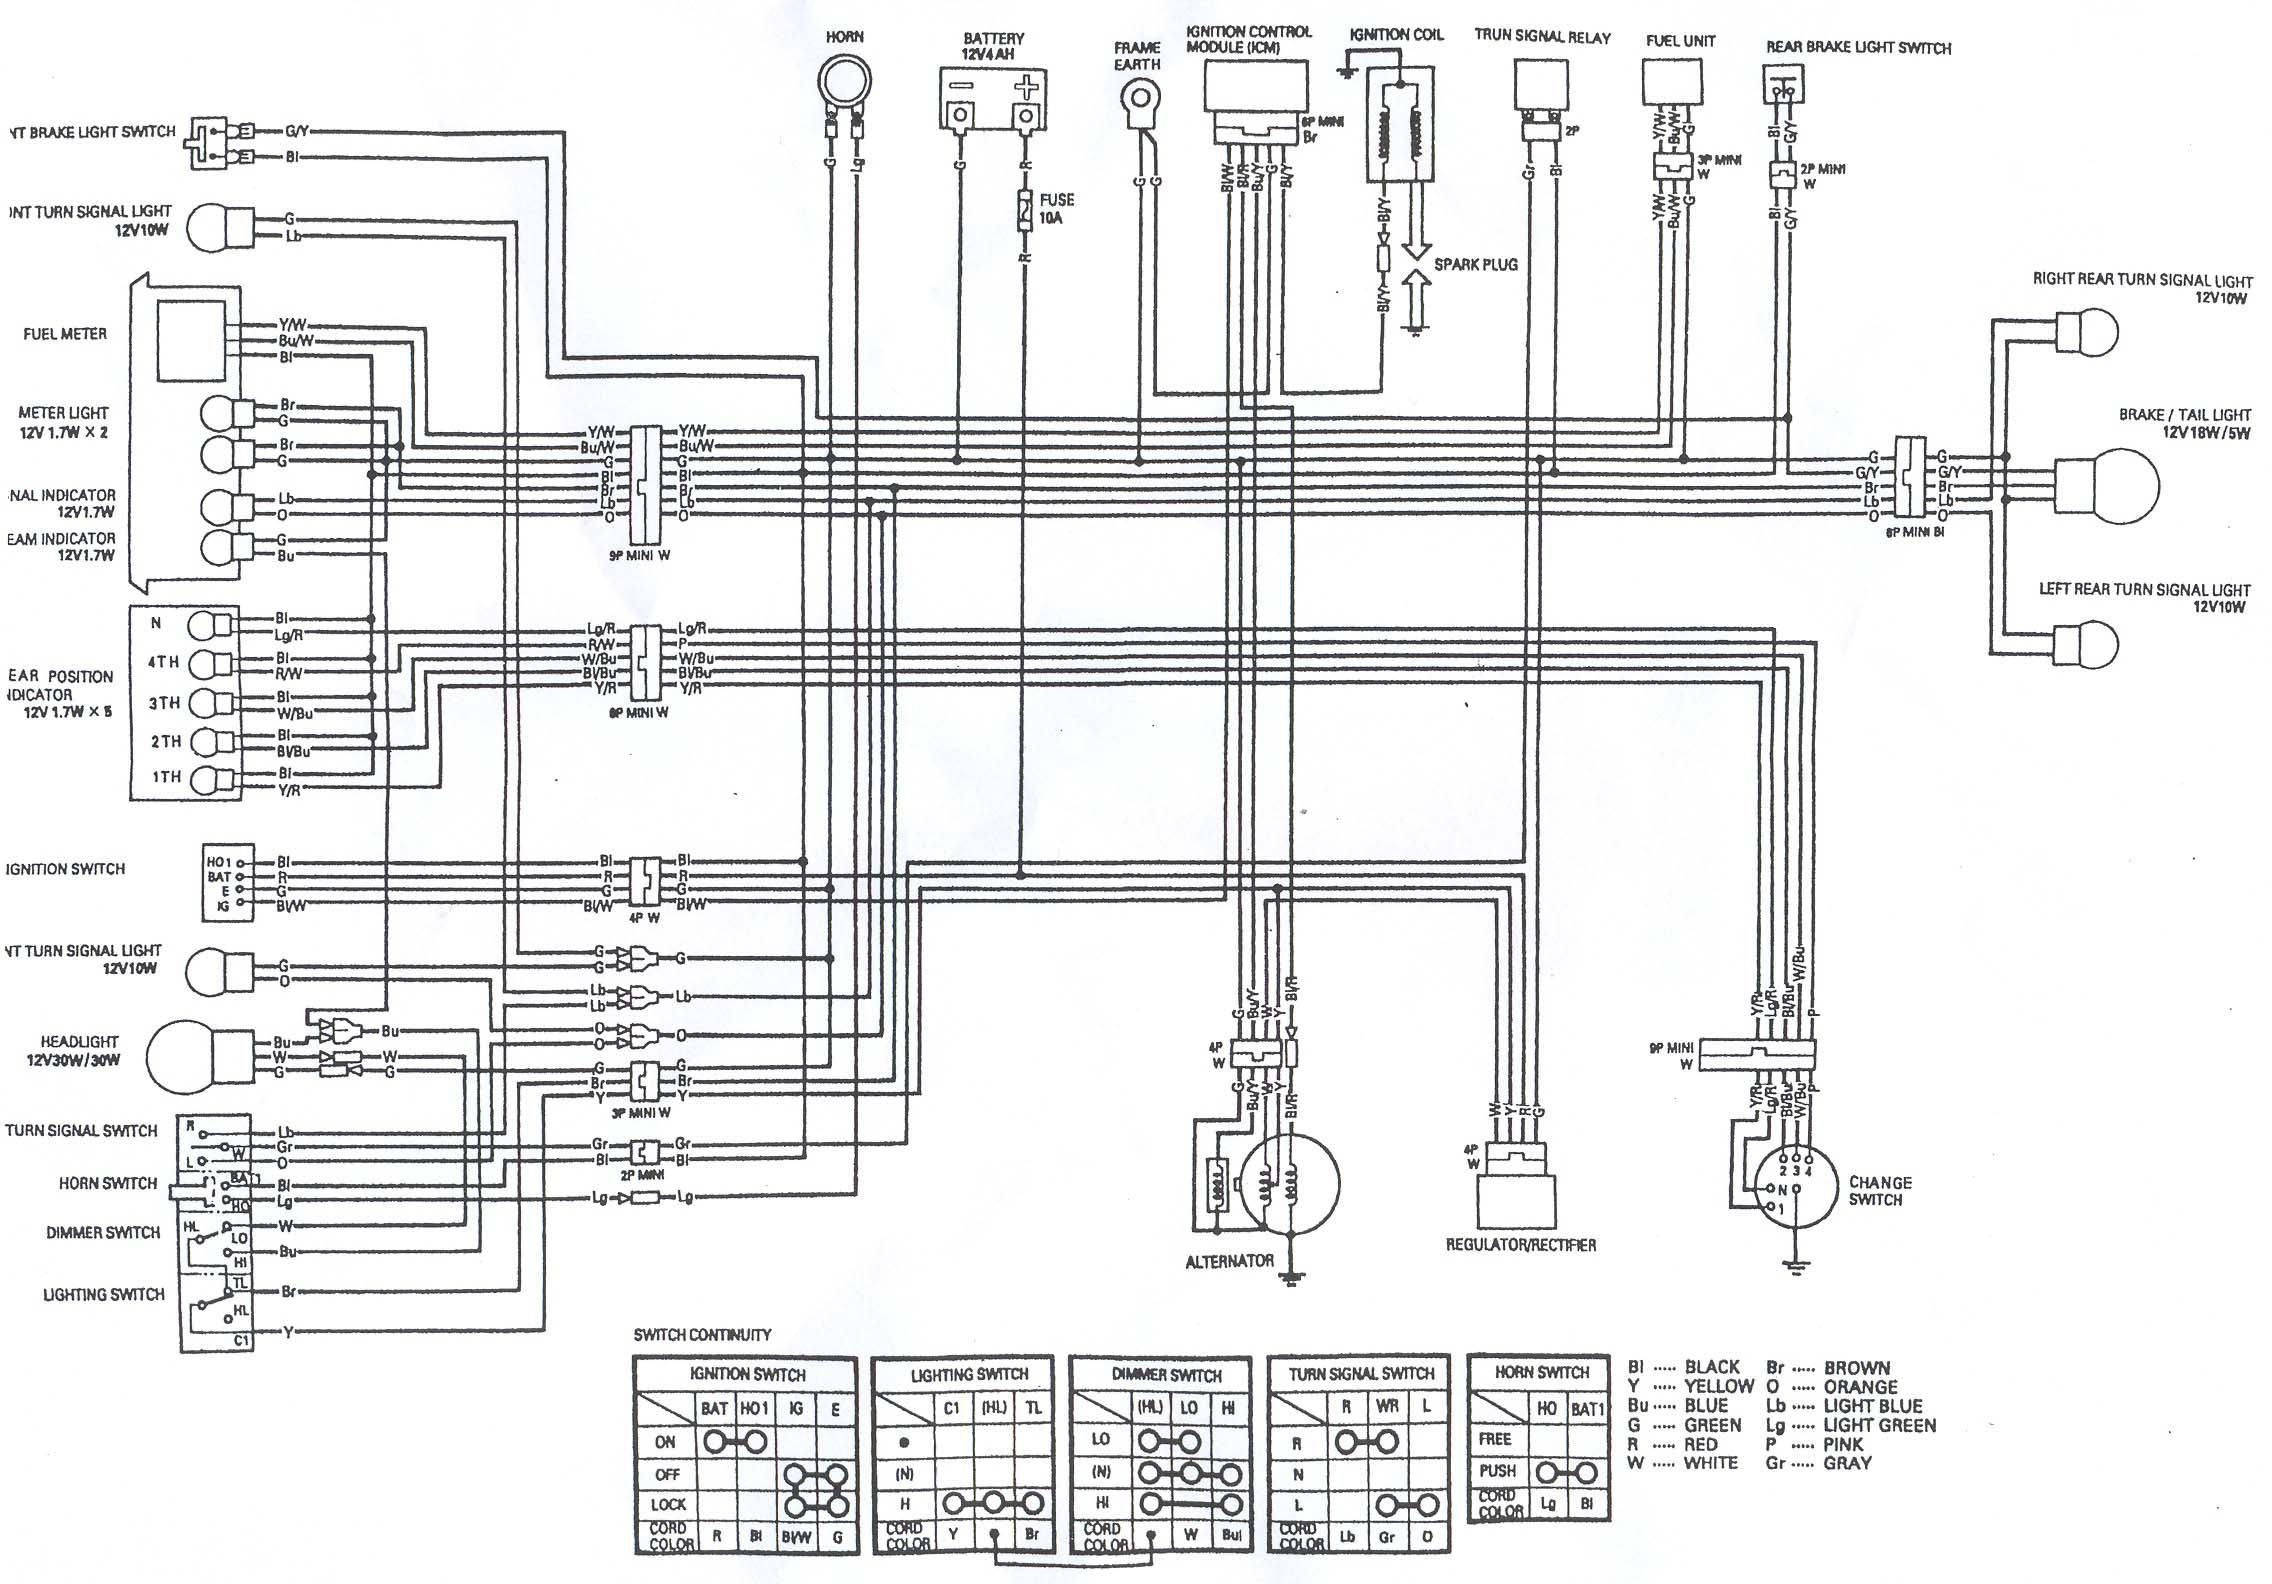 File Name Honda Cl70 Wiring Diagram